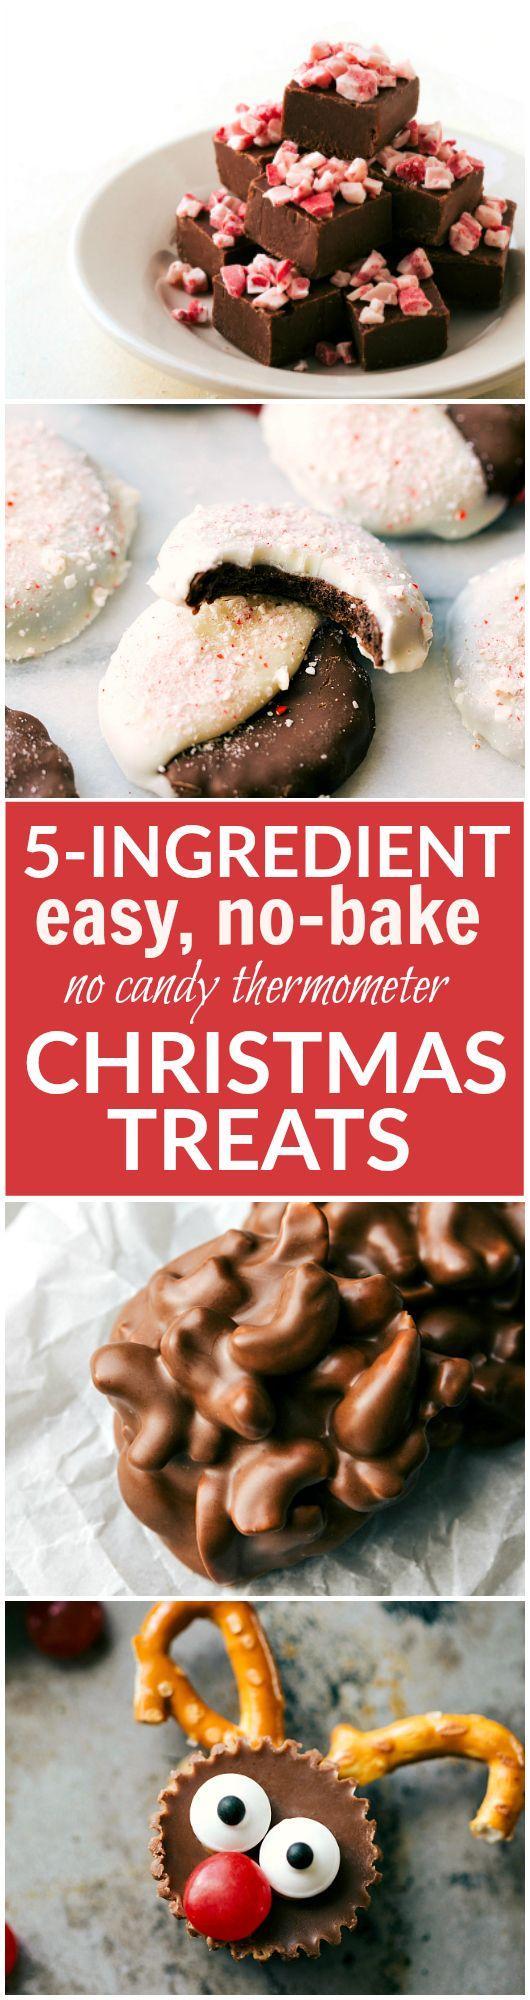 FOUR 5-Ingredient Christmas Treats